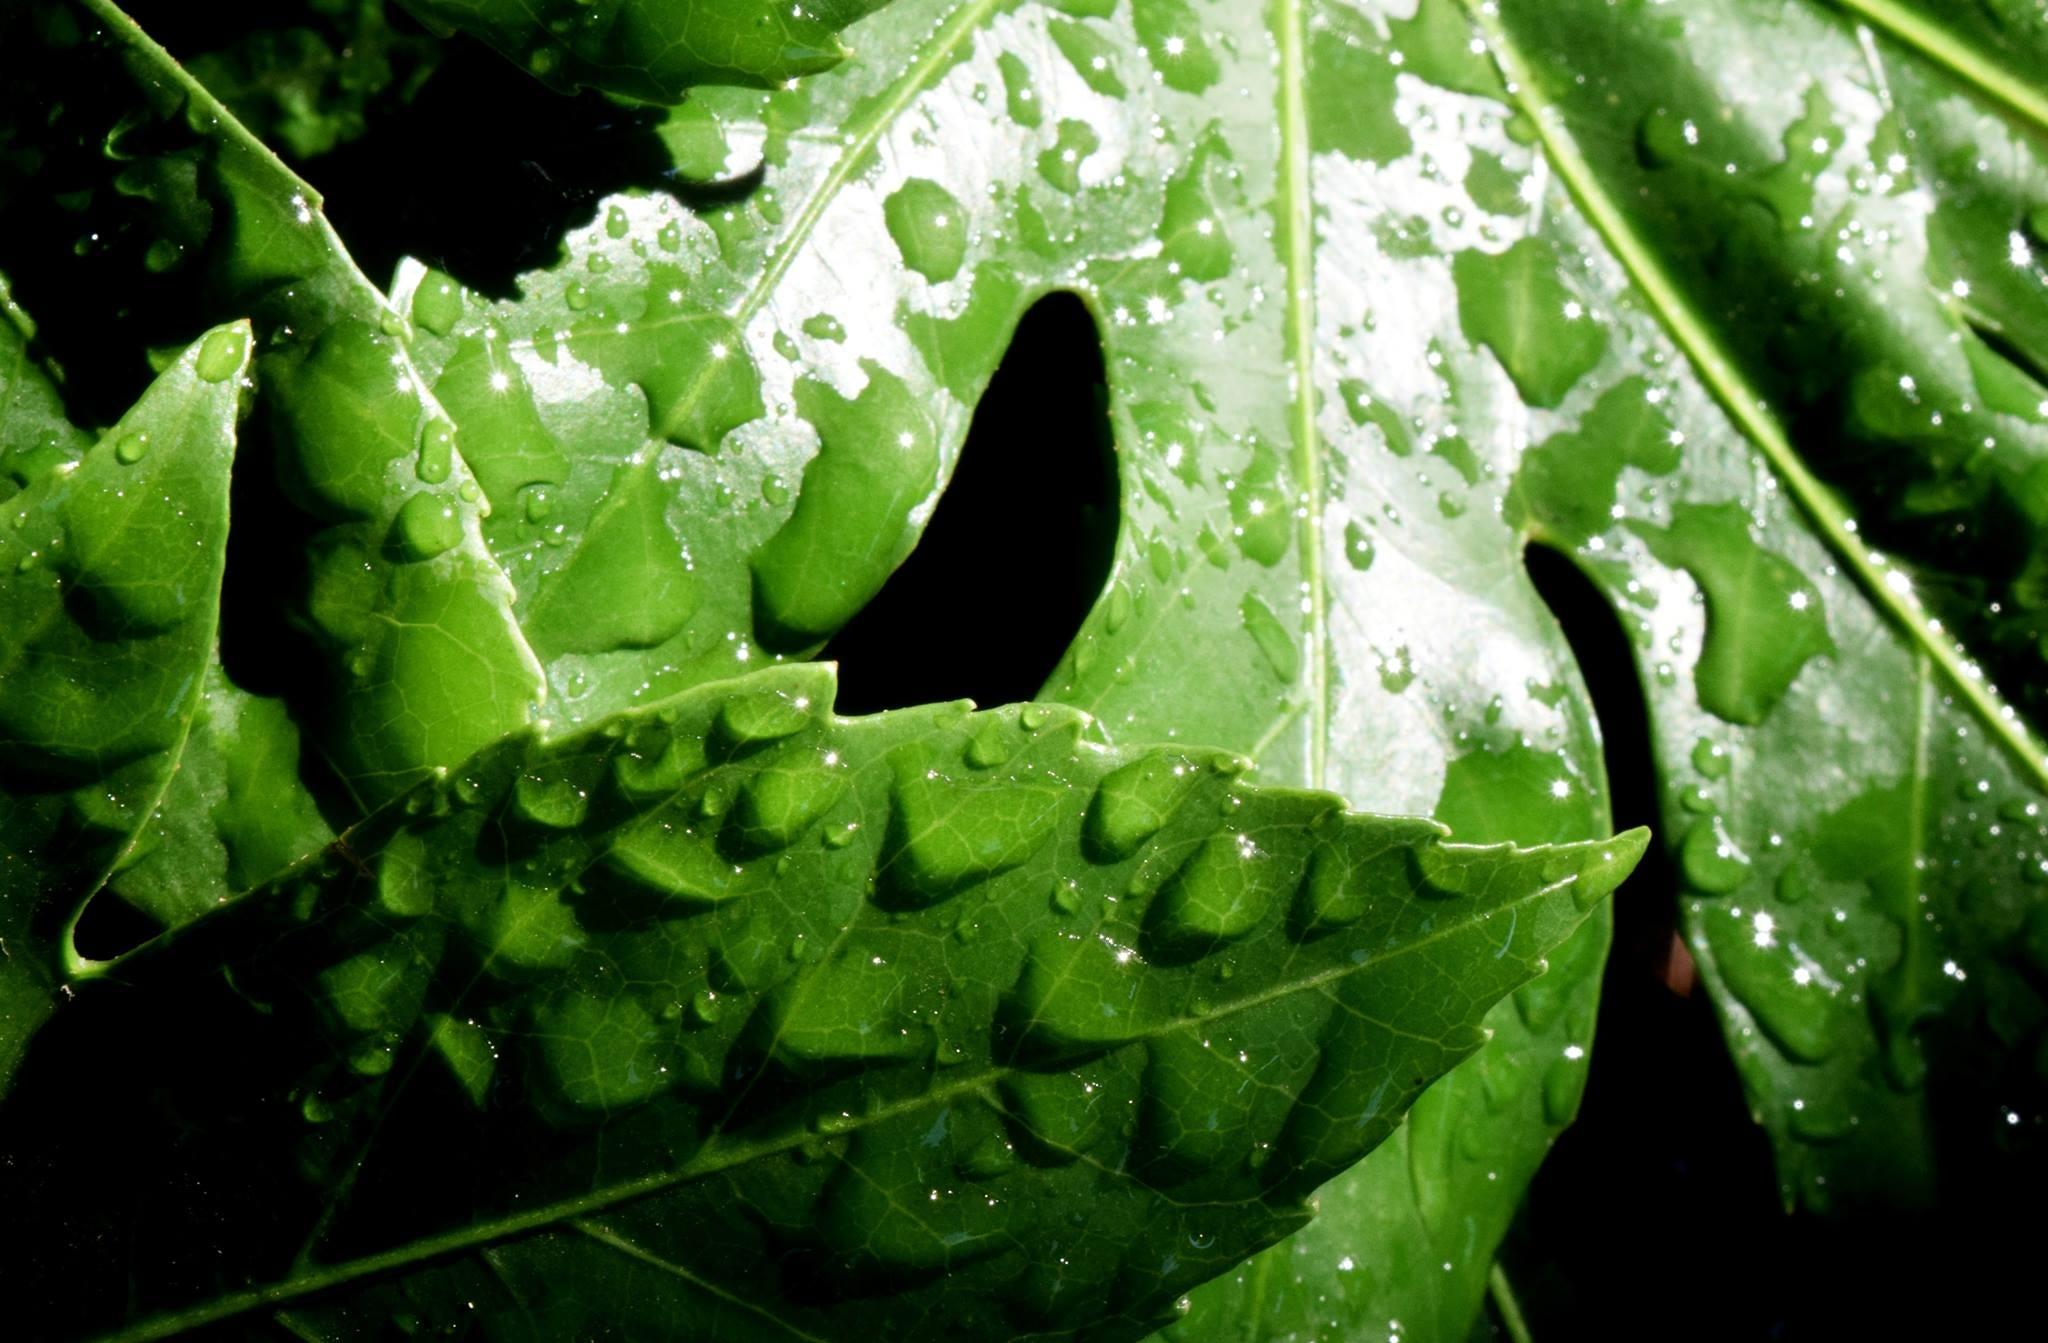 Tropical Rain by Frank Dunford